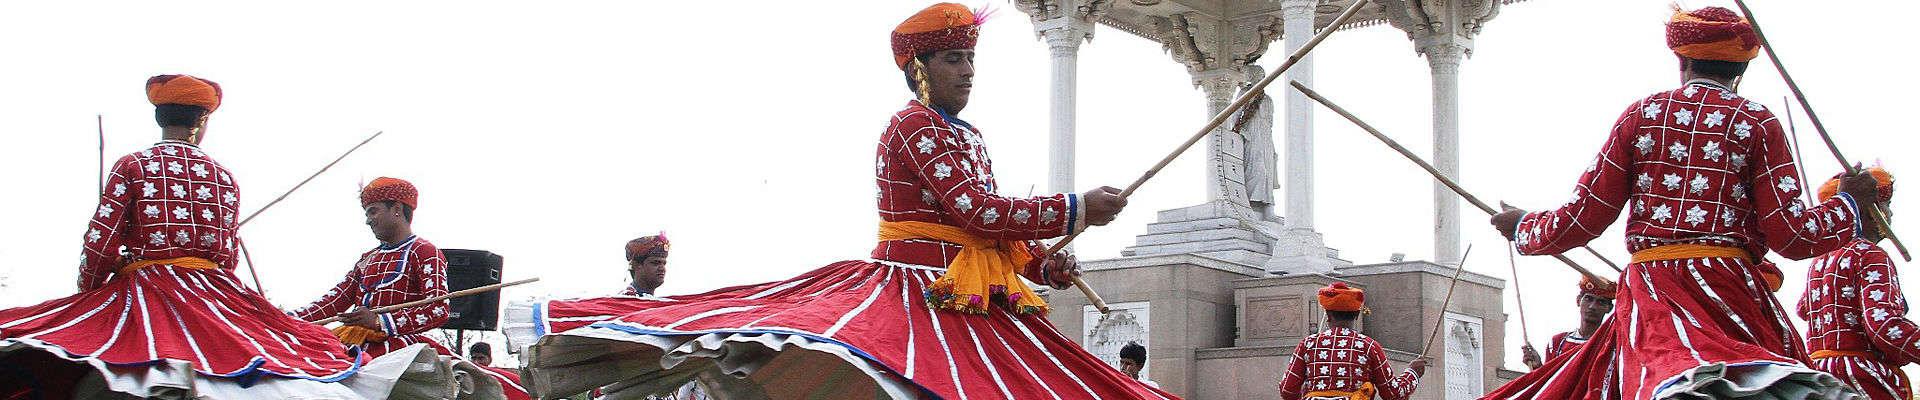 Glory Of Rajasthan